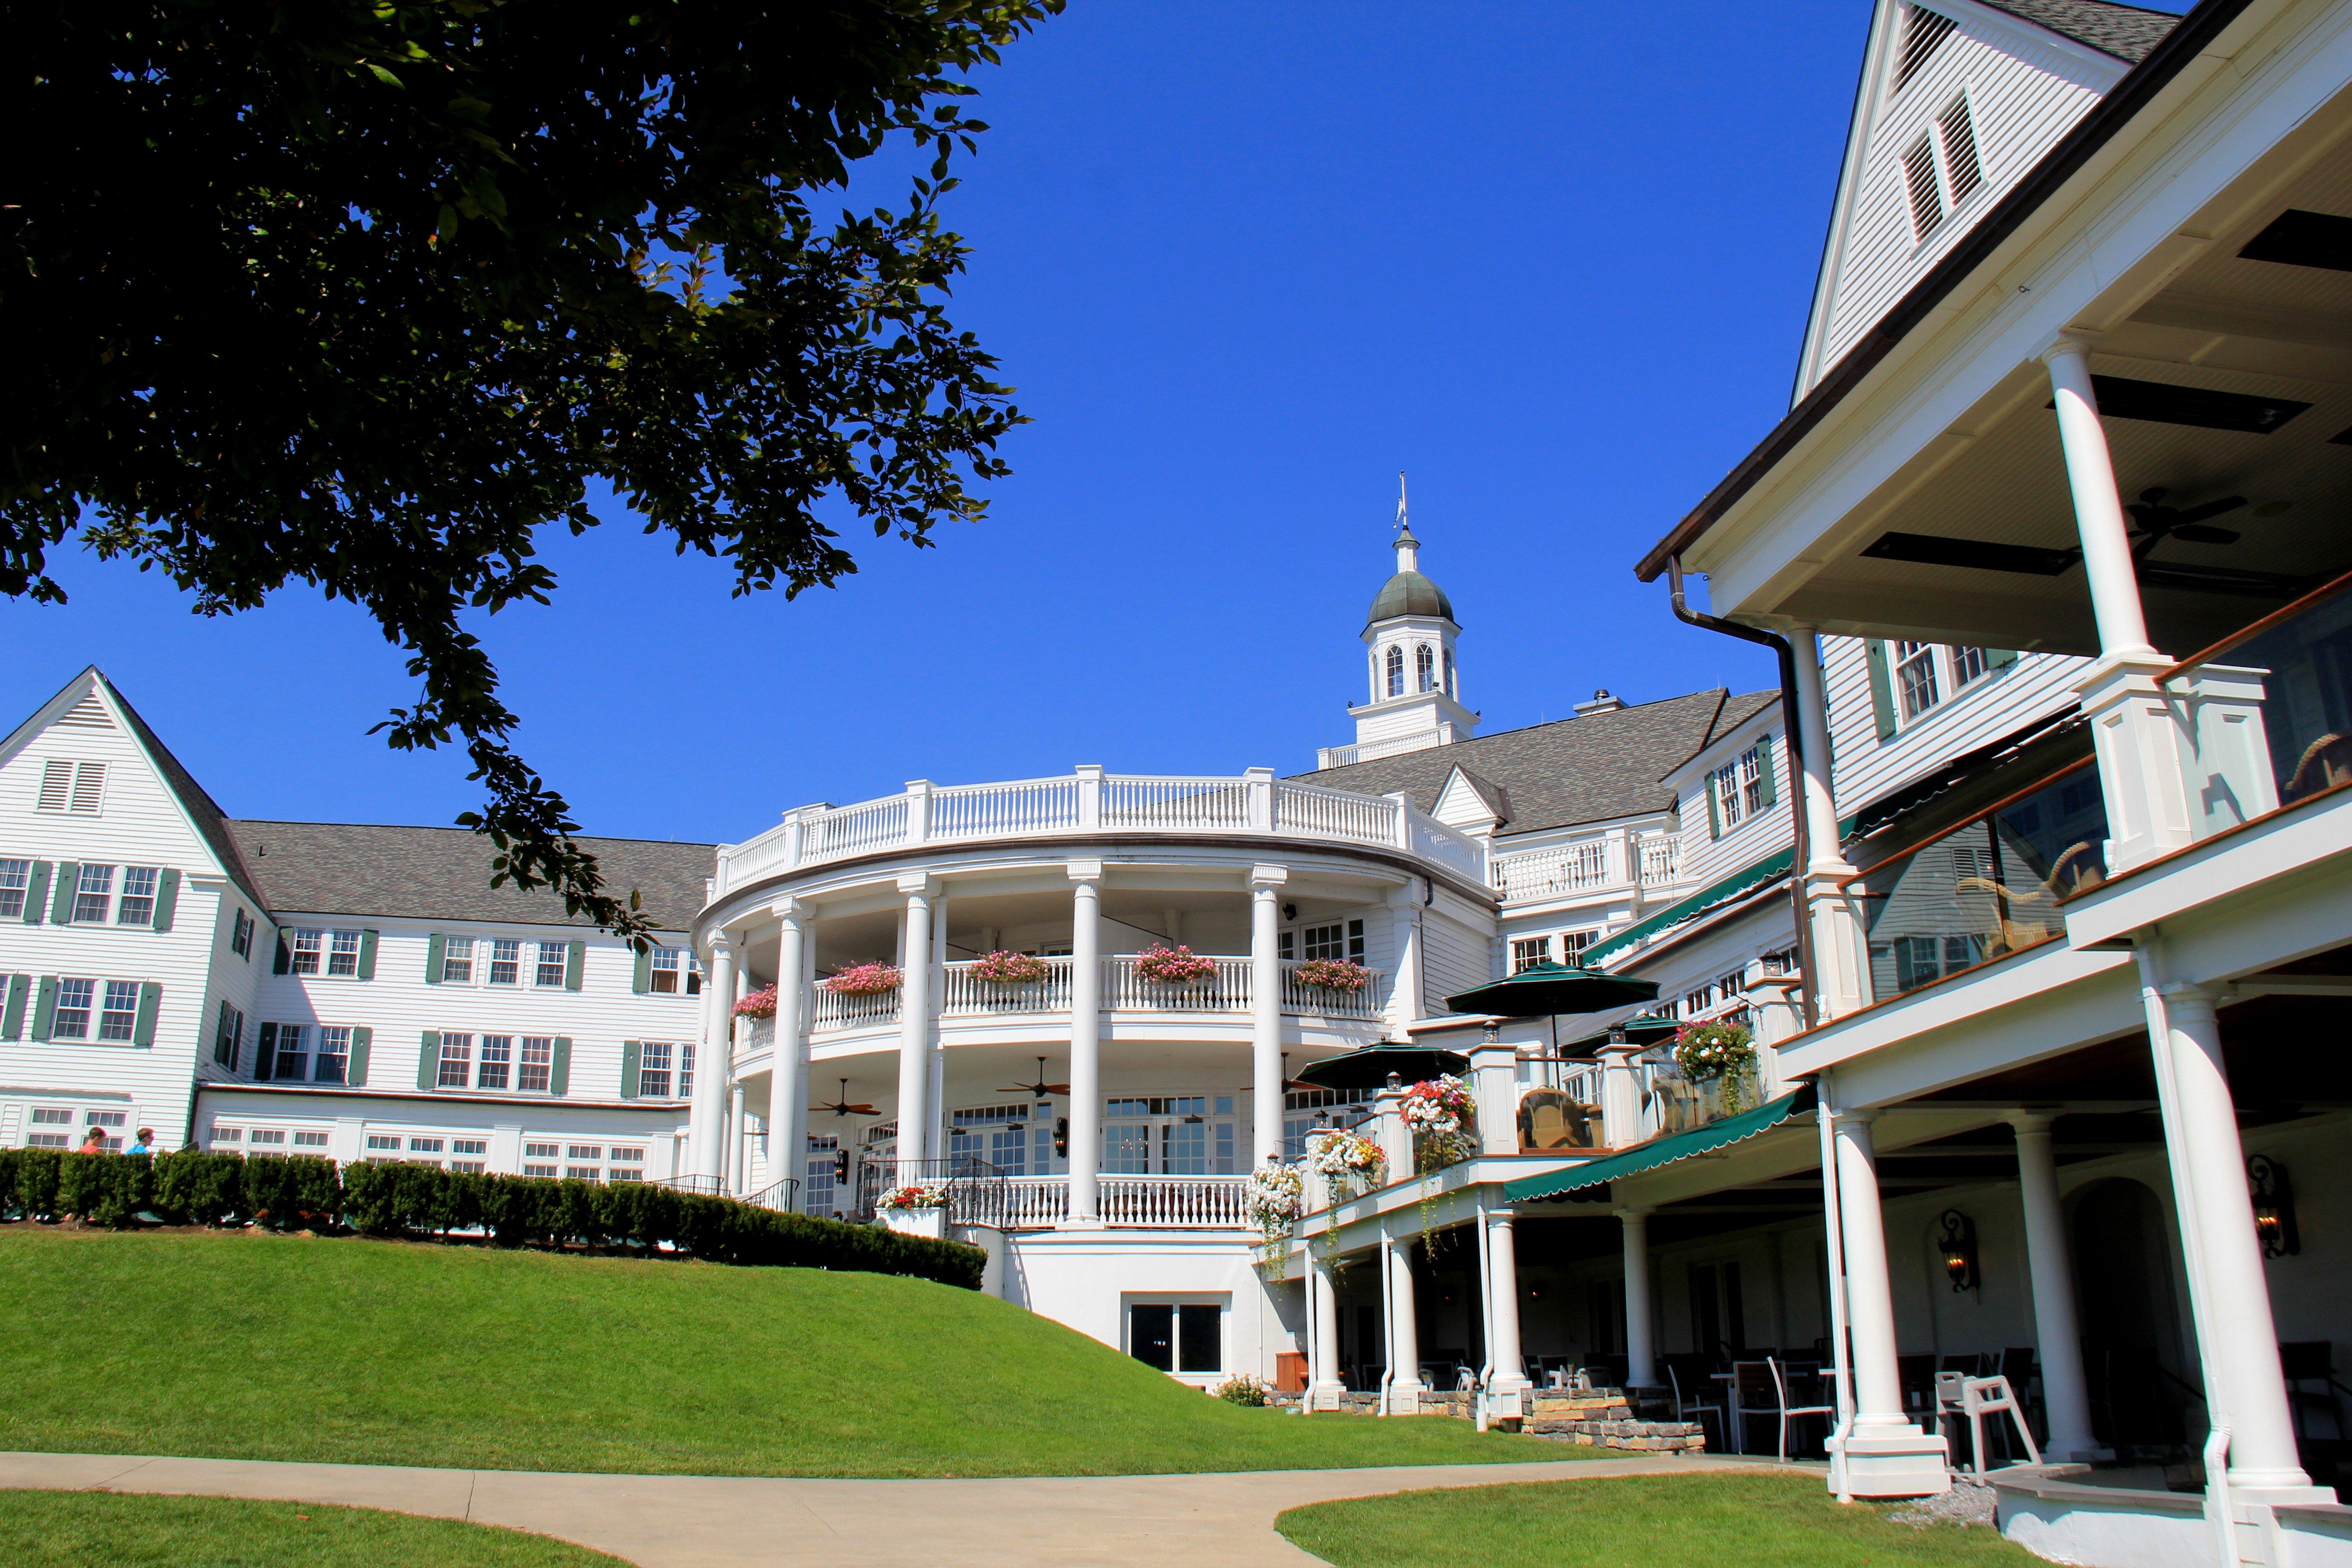 The Sagamore Resort Architecture